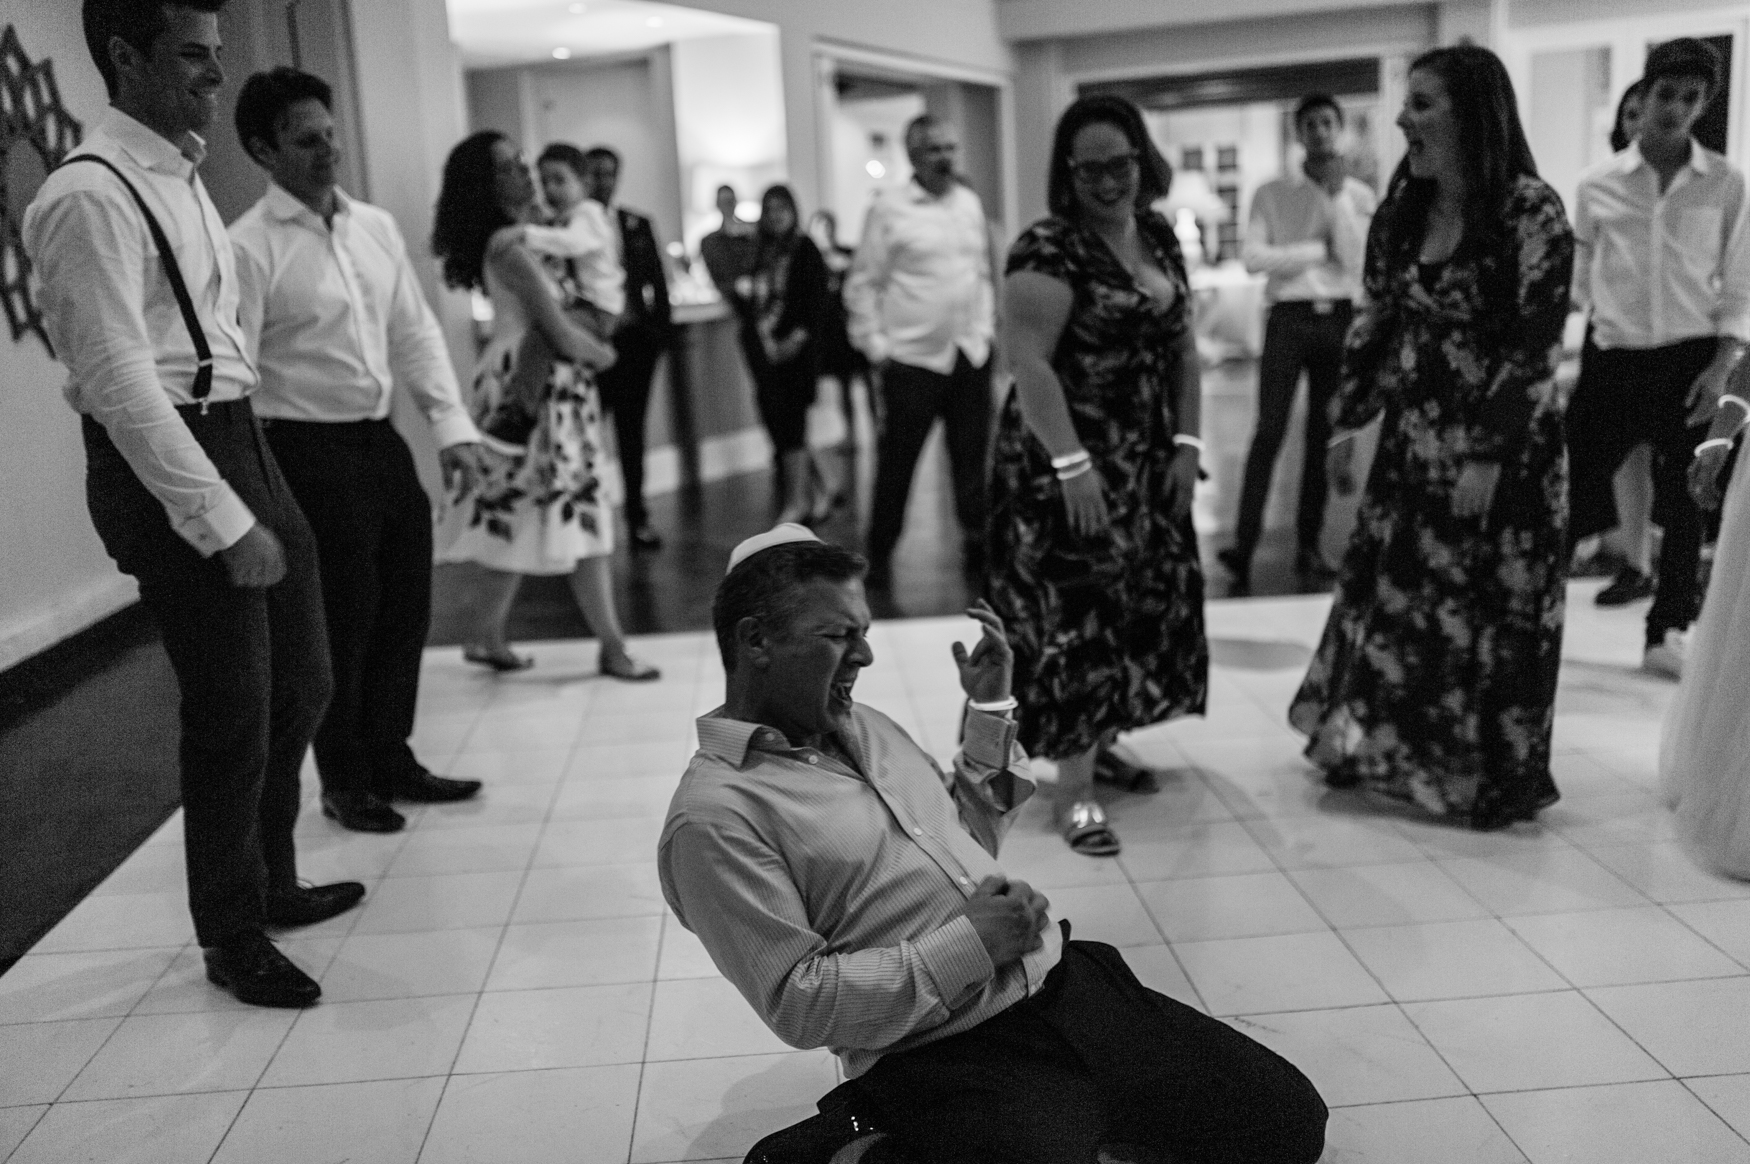 Leon_&_Martine's_Wedding_Photographs_17th_April_2019_@johnhenryweddingphoto_Low_Resolution_Web-608.JPG